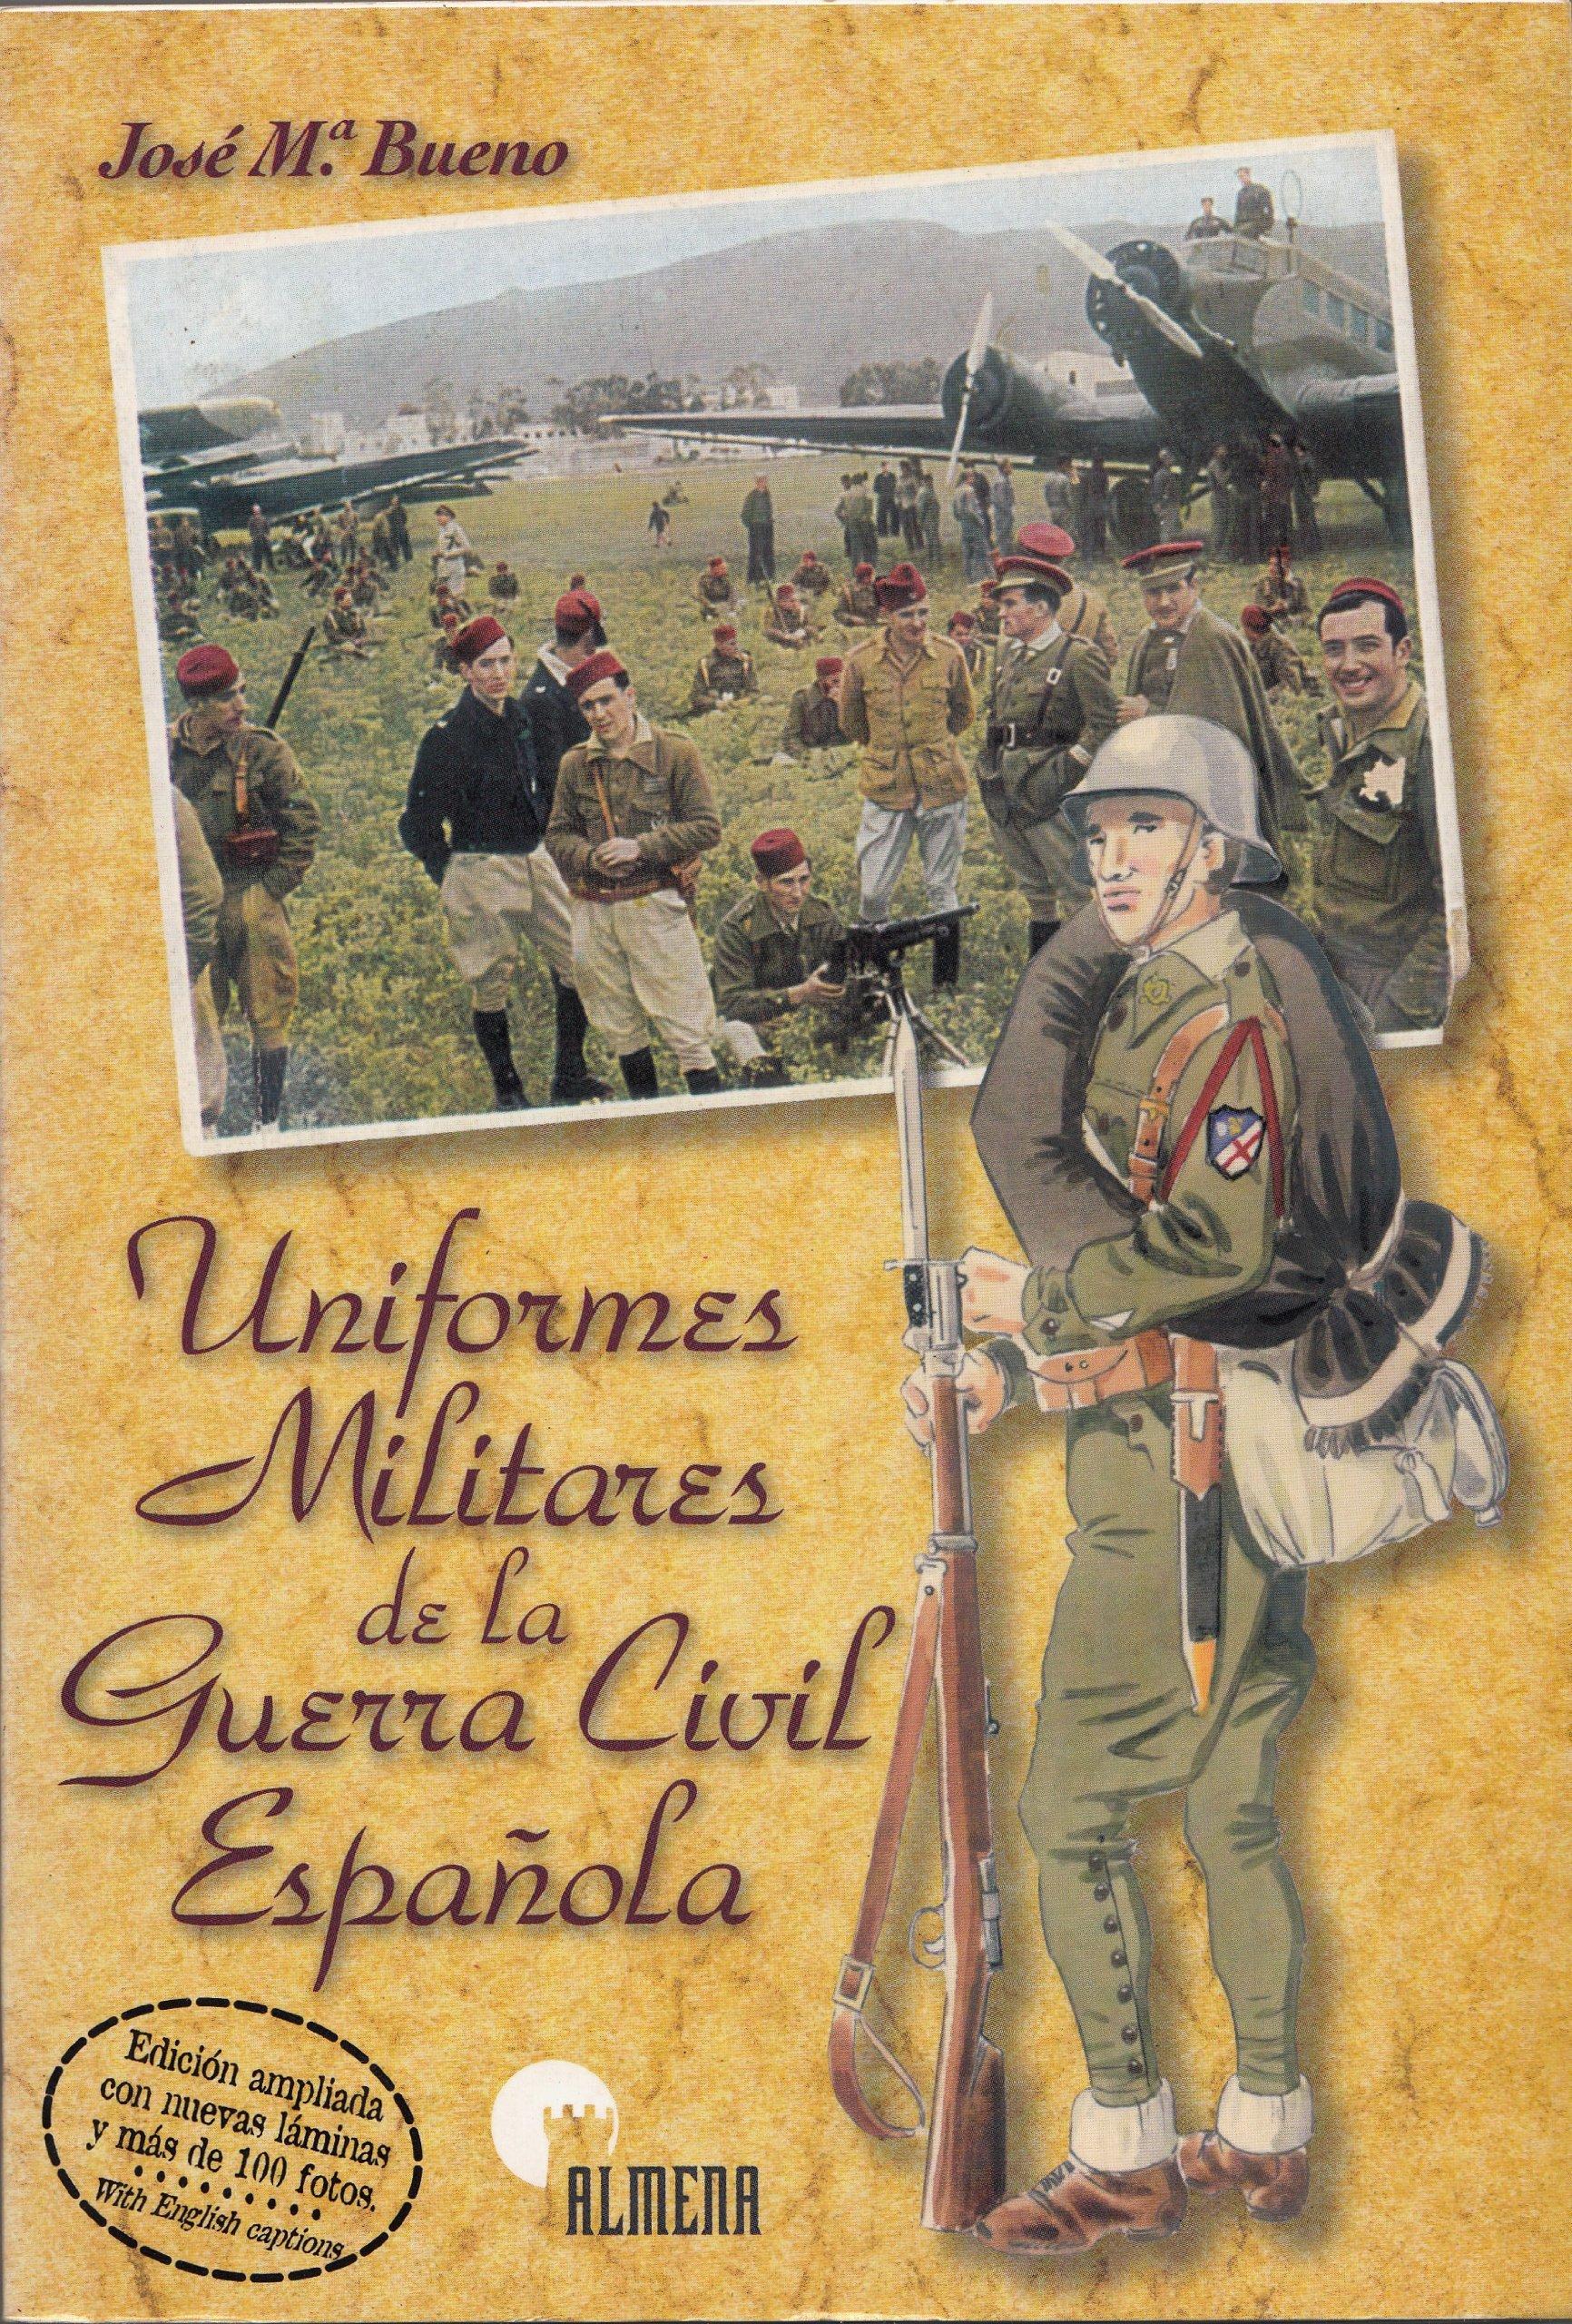 Uniformes militares de Guerra civil española: Amazon.es: Bueno ...